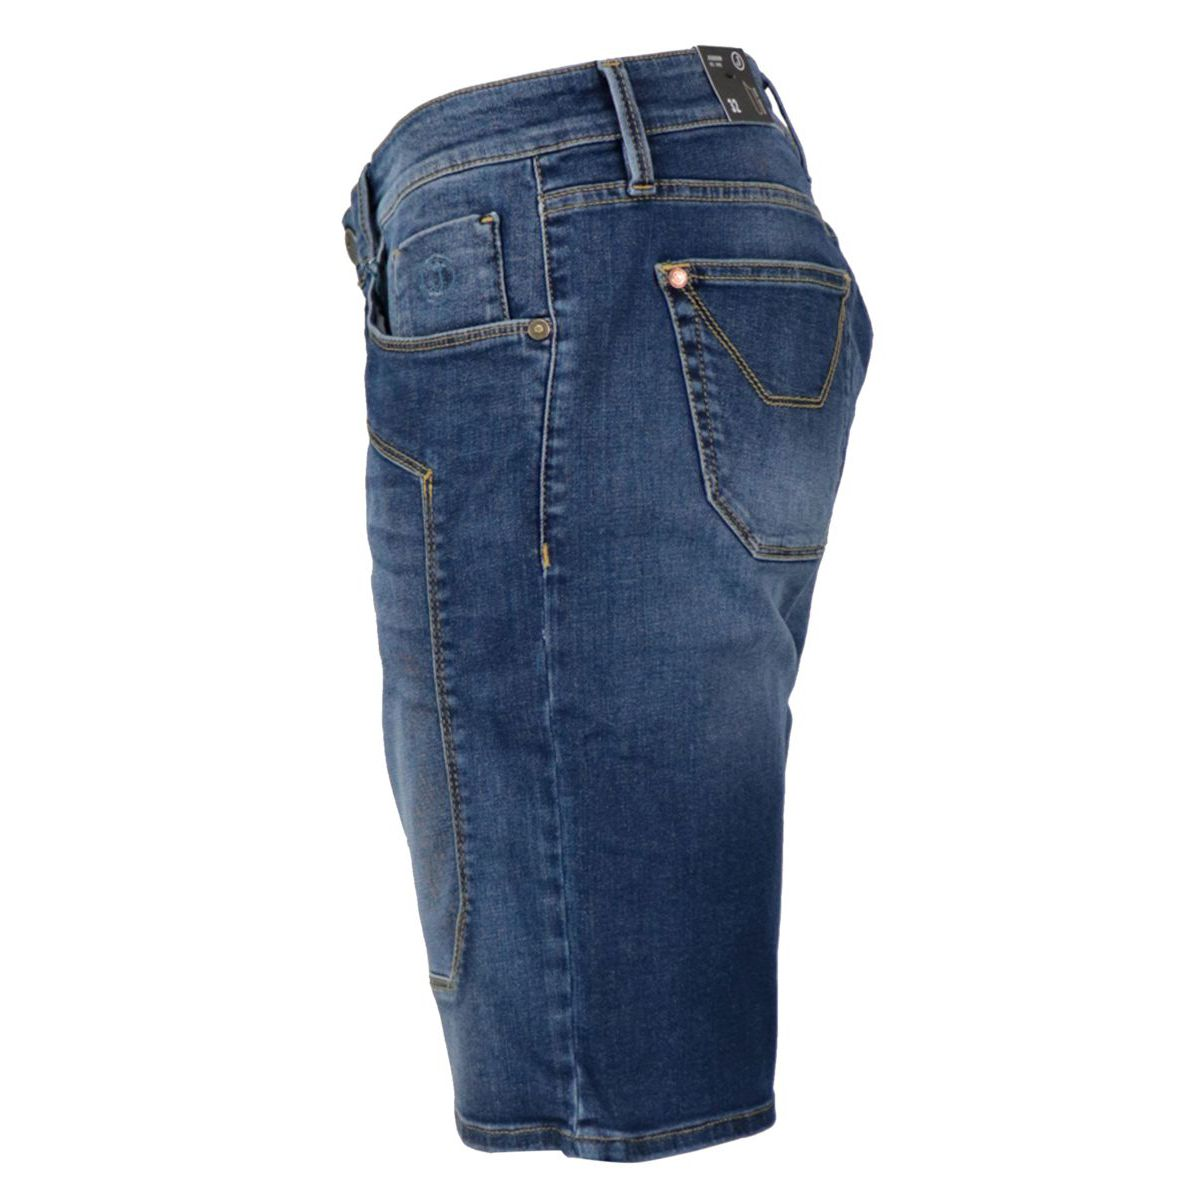 Denim shorts with 5-pocket patch Denim Jeckerson